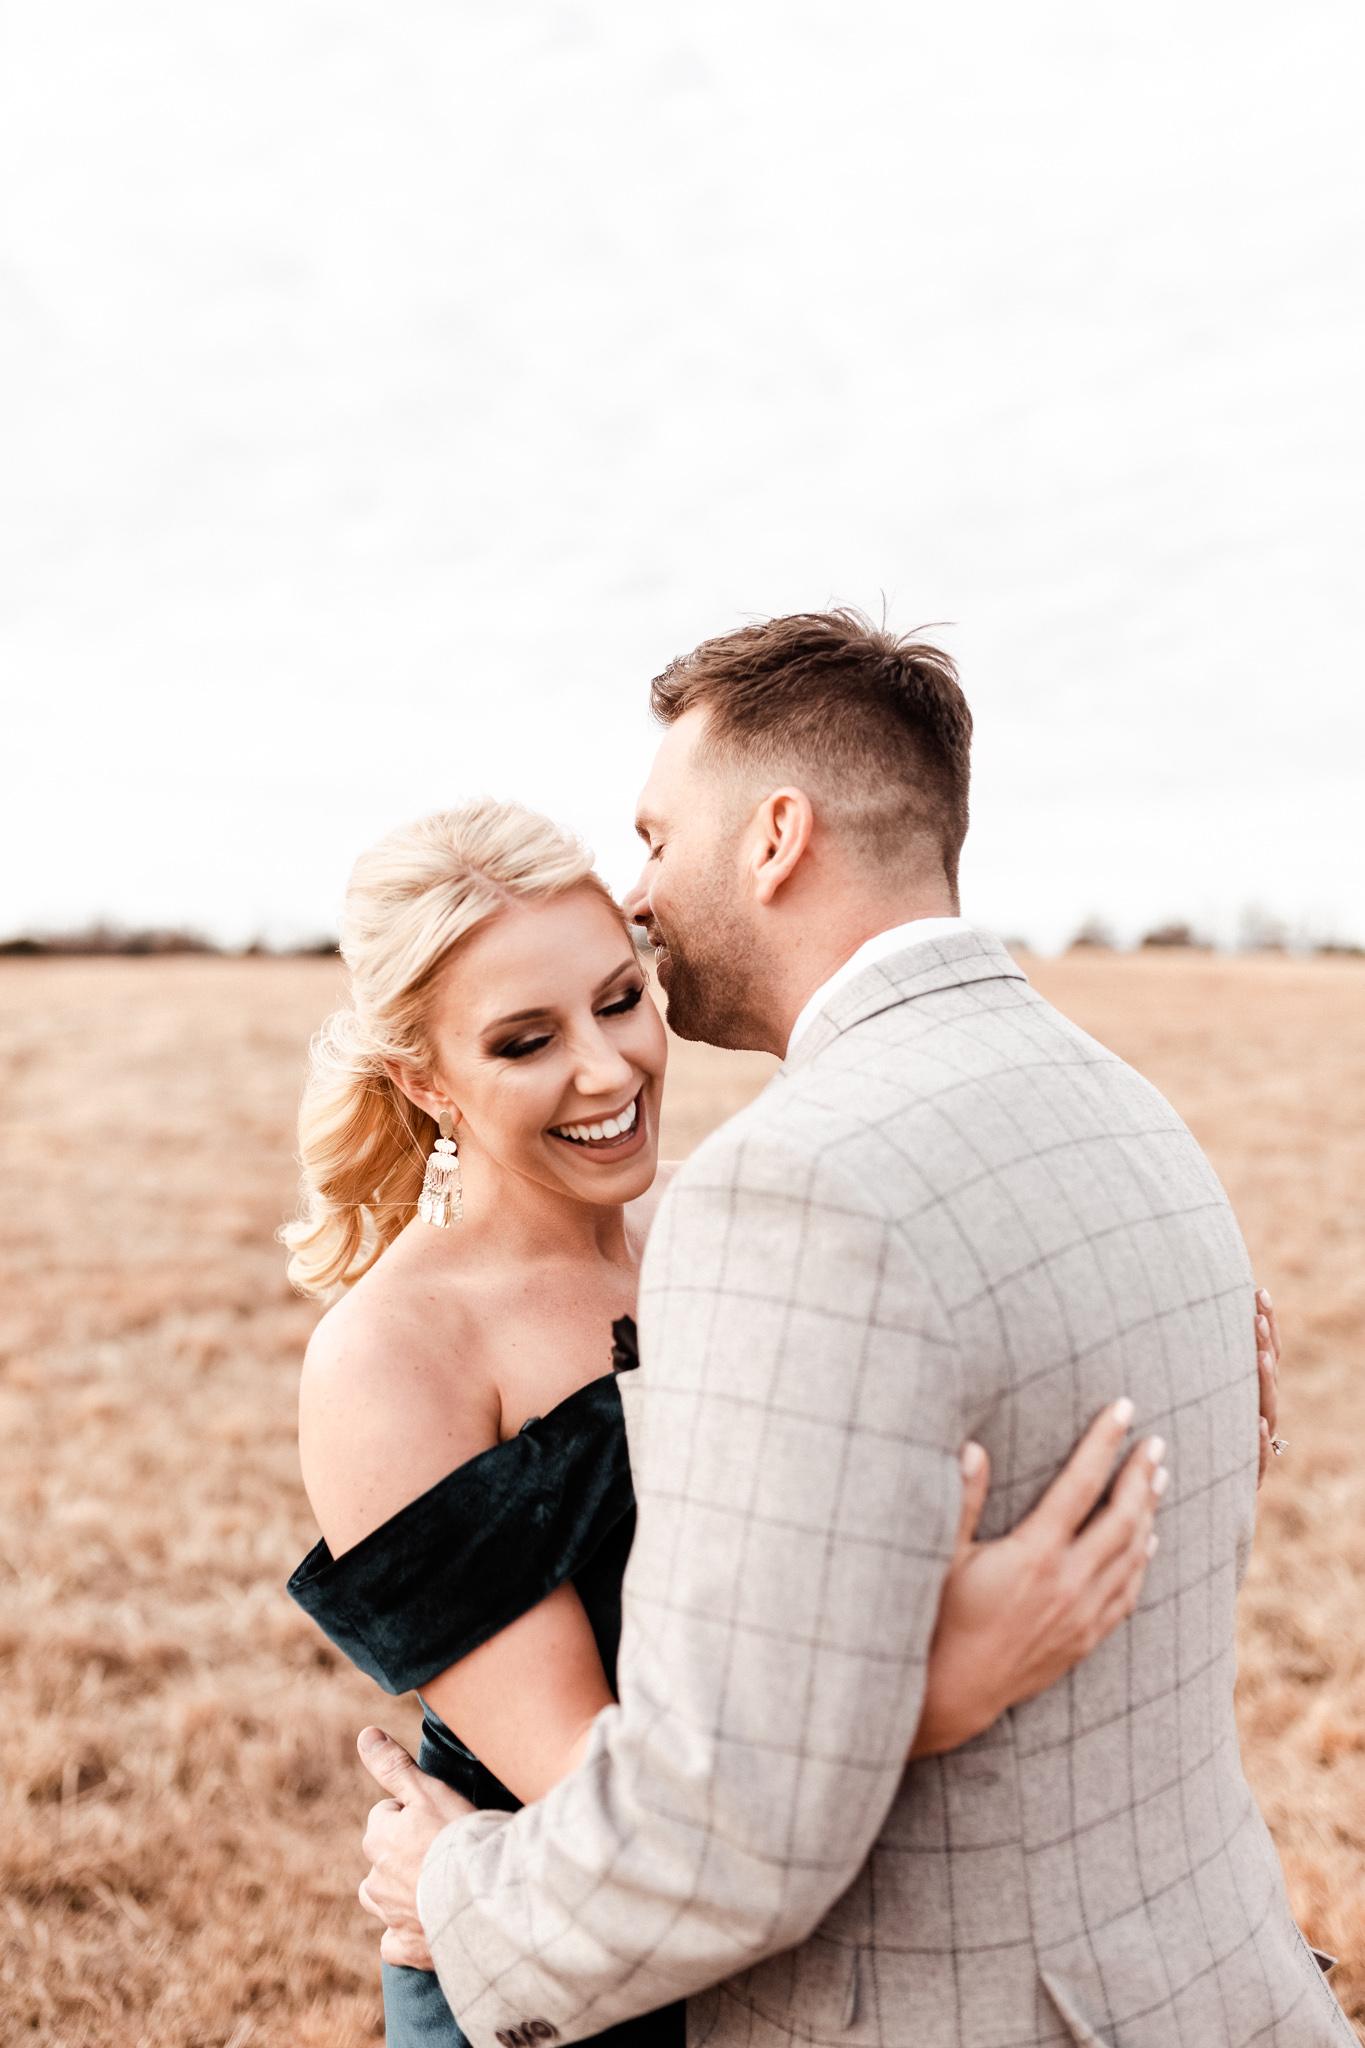 Wade + Stephanie | Warm Open Field Engagements | Oklahoma Wedding Photographer-9.jpg